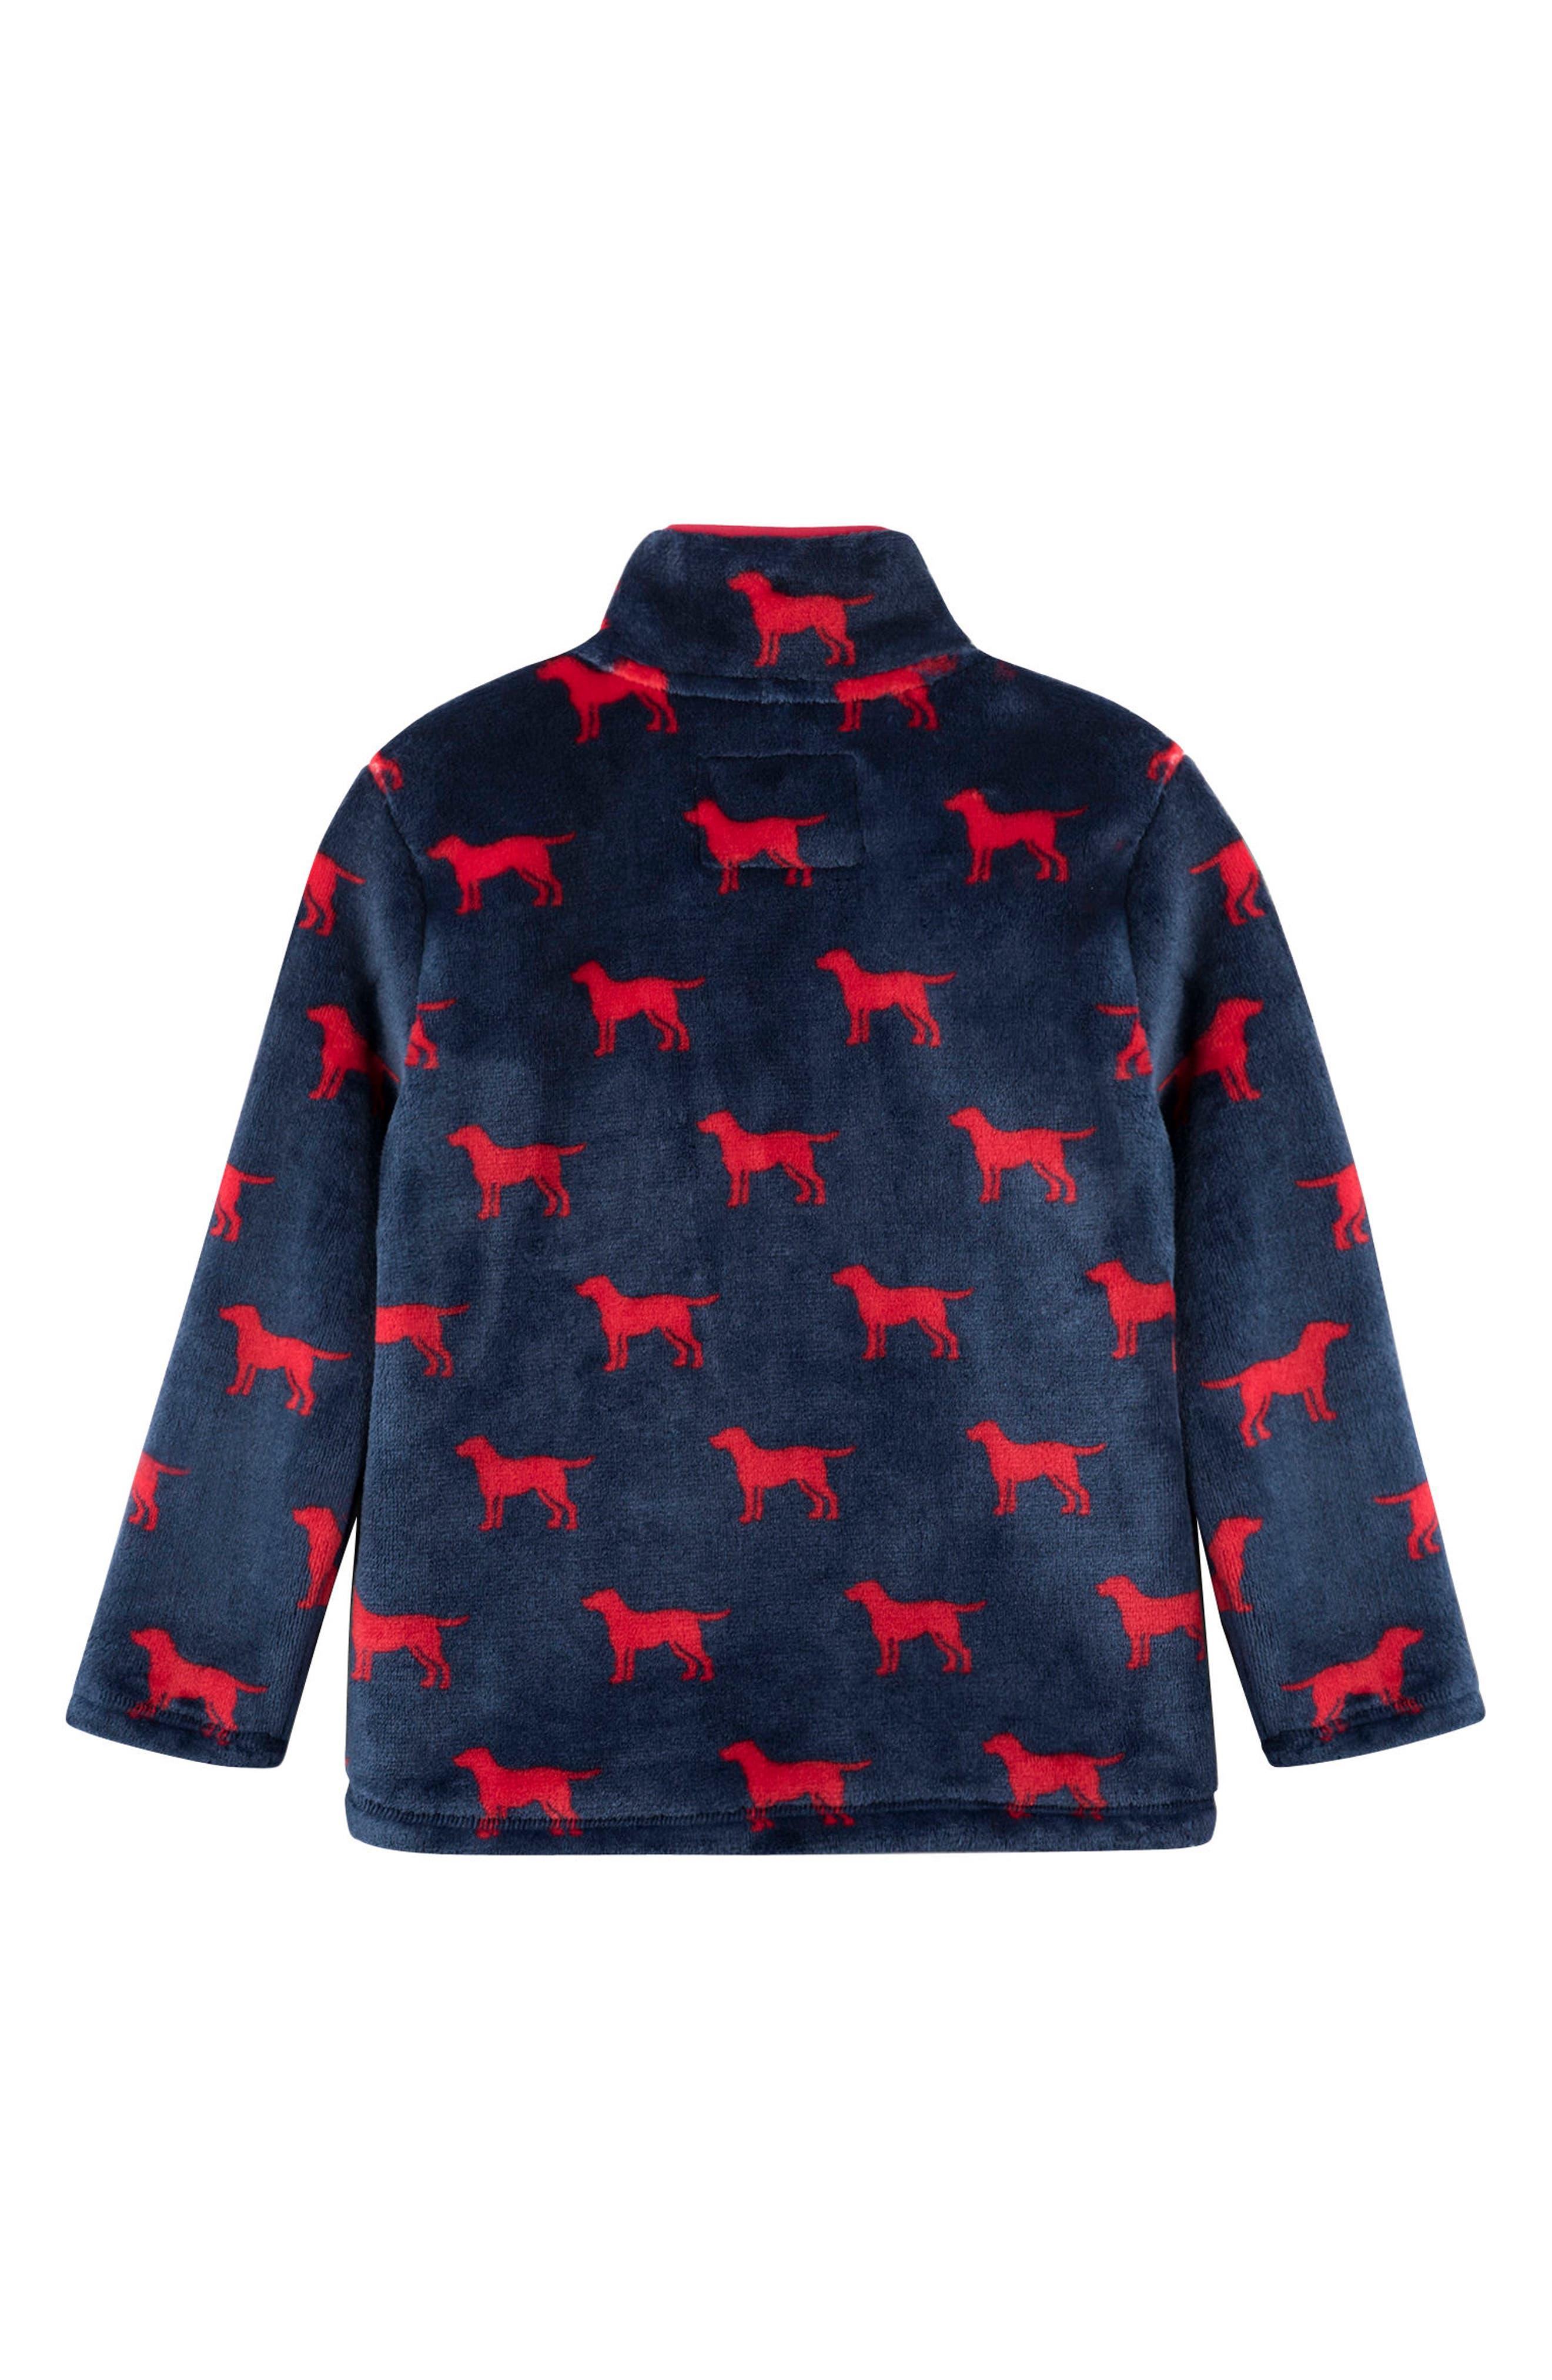 HATLEY, Red Labs Fleece Jacket, Alternate thumbnail 2, color, 400